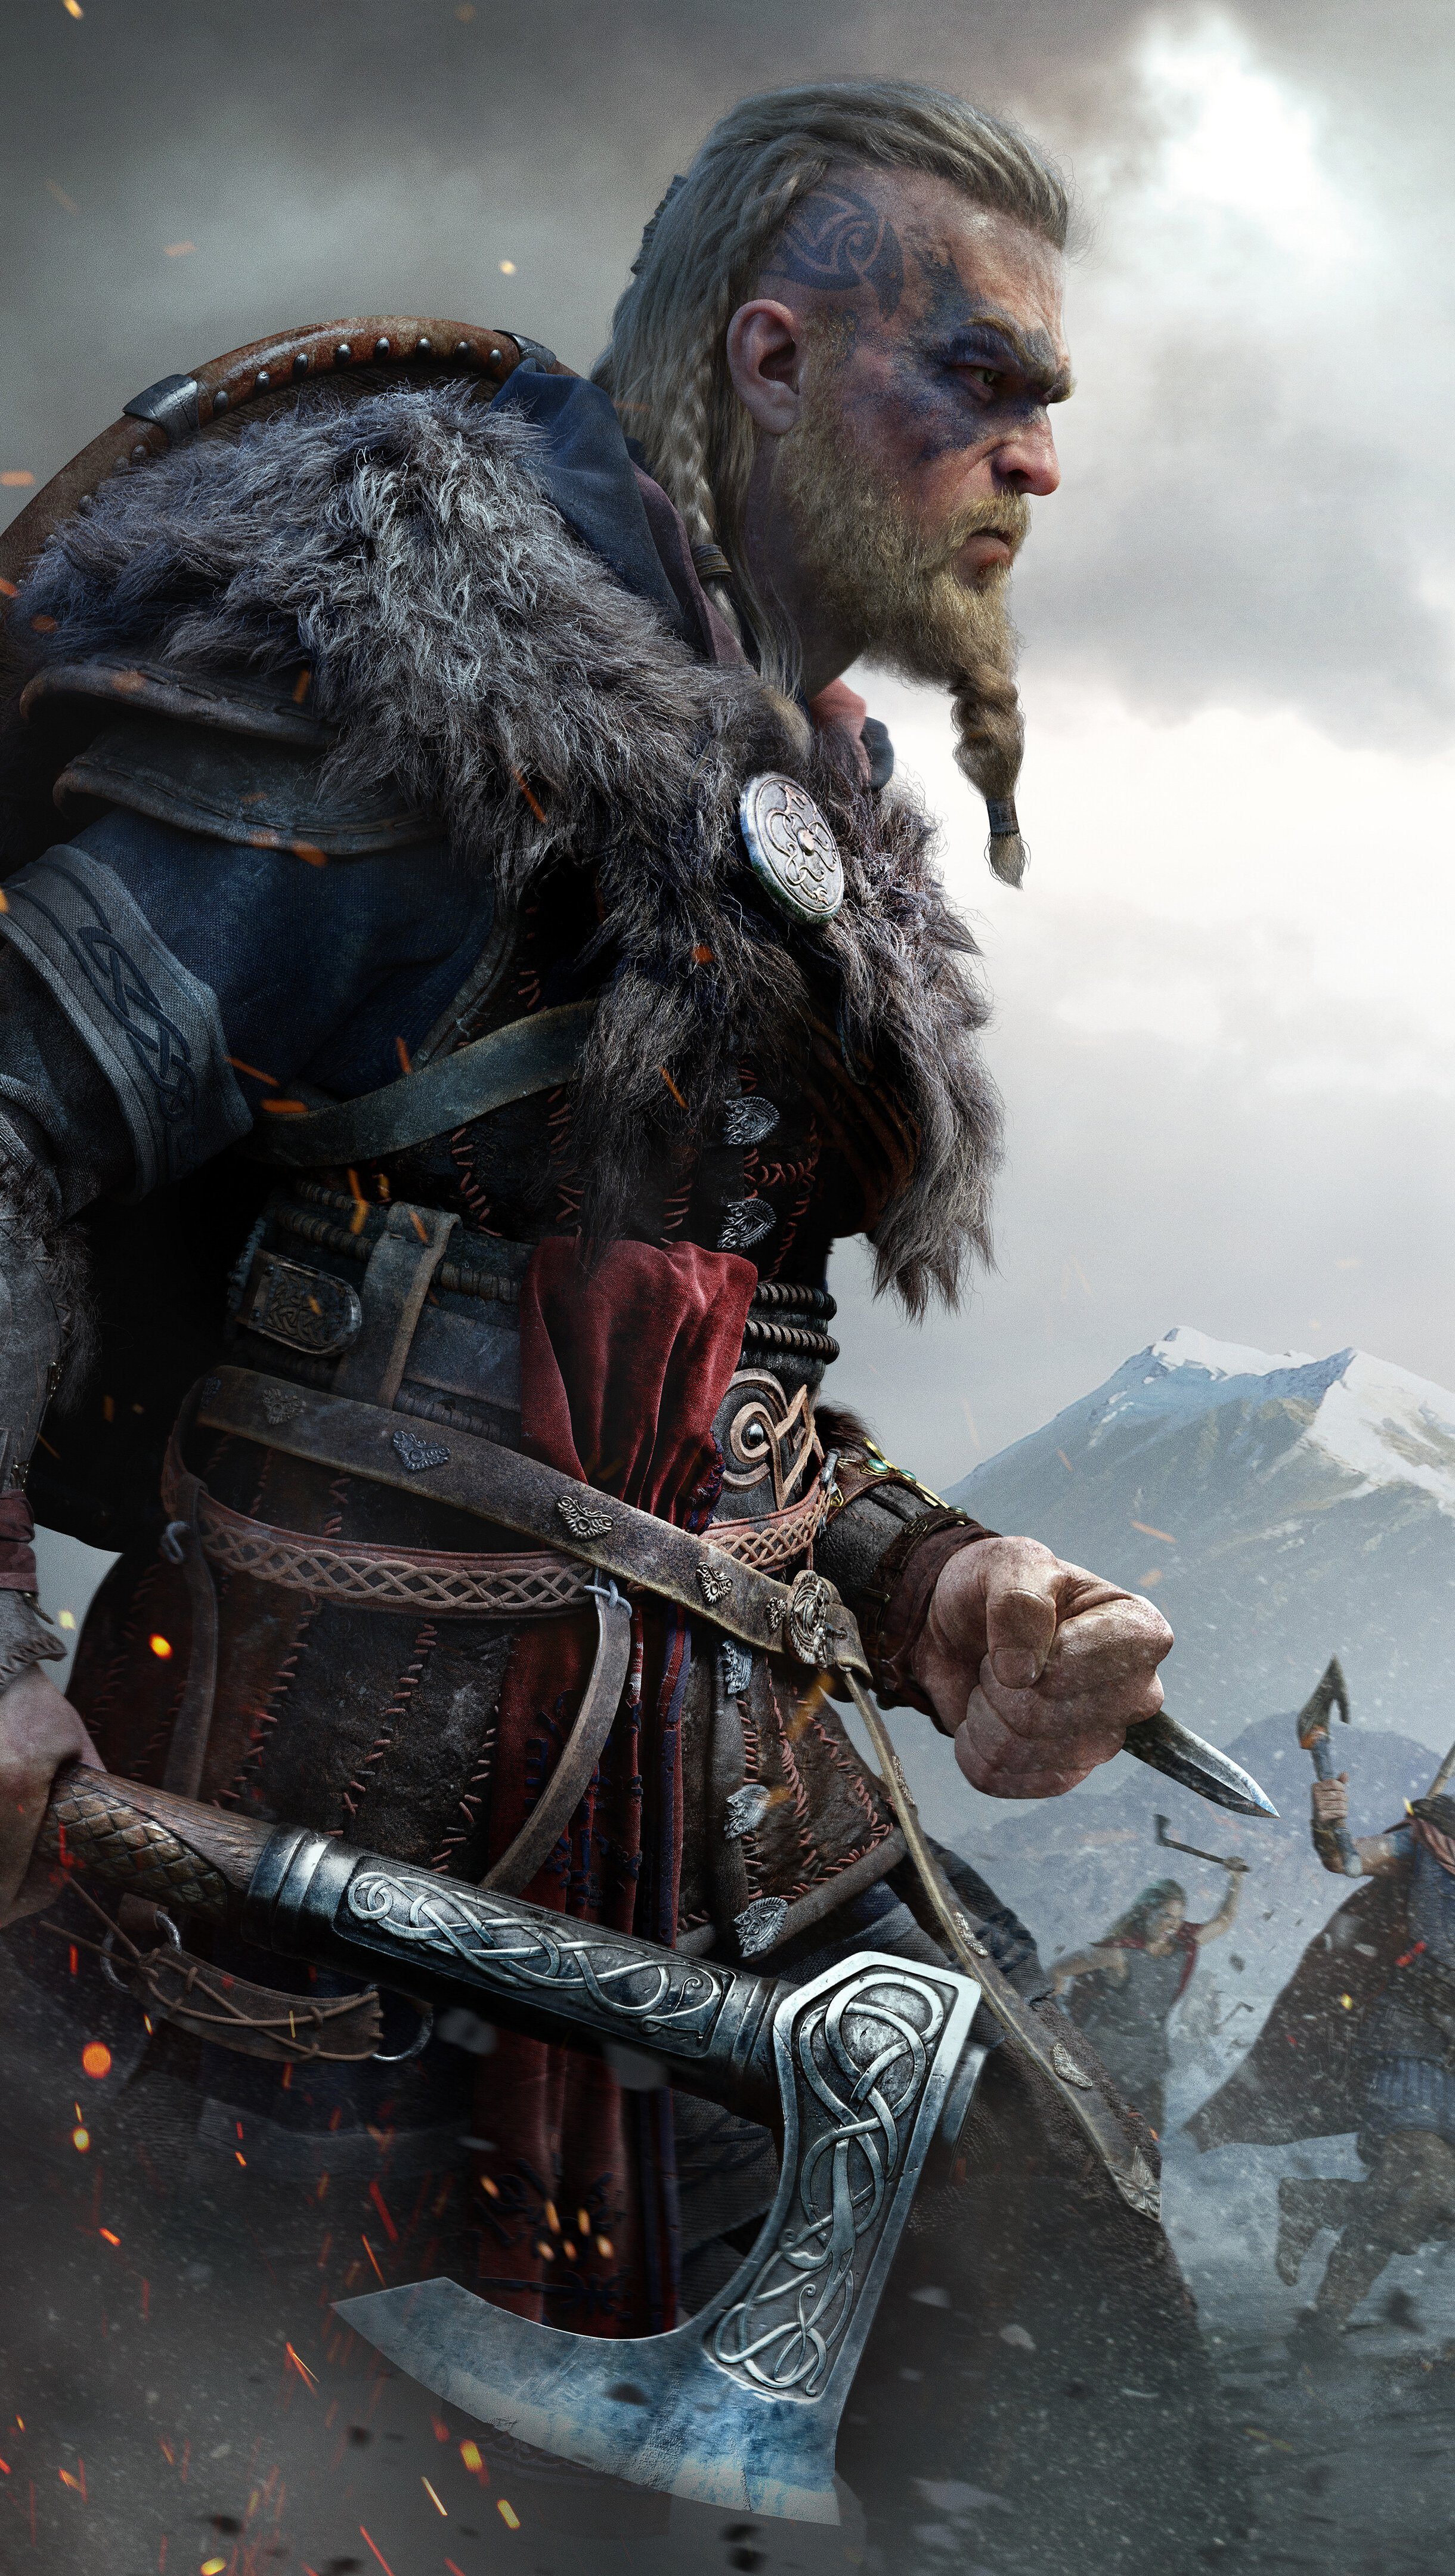 Fondos de pantalla Eivor Assassins Creed Valhalla Vertical